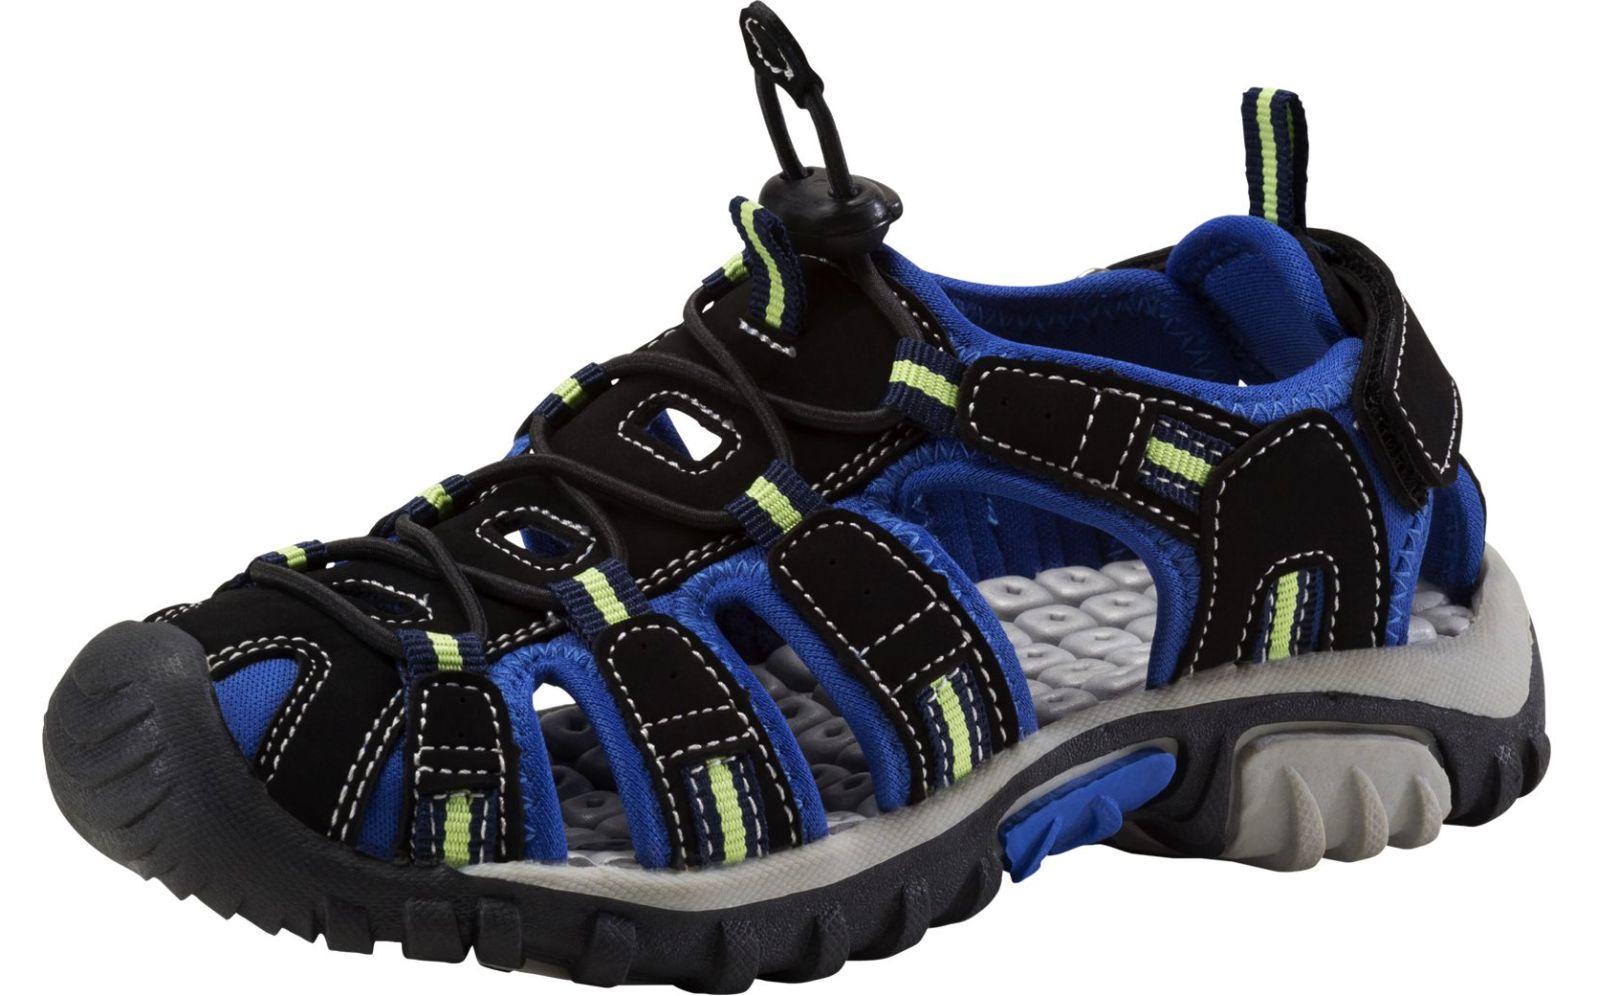 McKinley Kinder Trekking-Sandale Vapor 2 JR navy schwarz / blau / grün, Größe:38